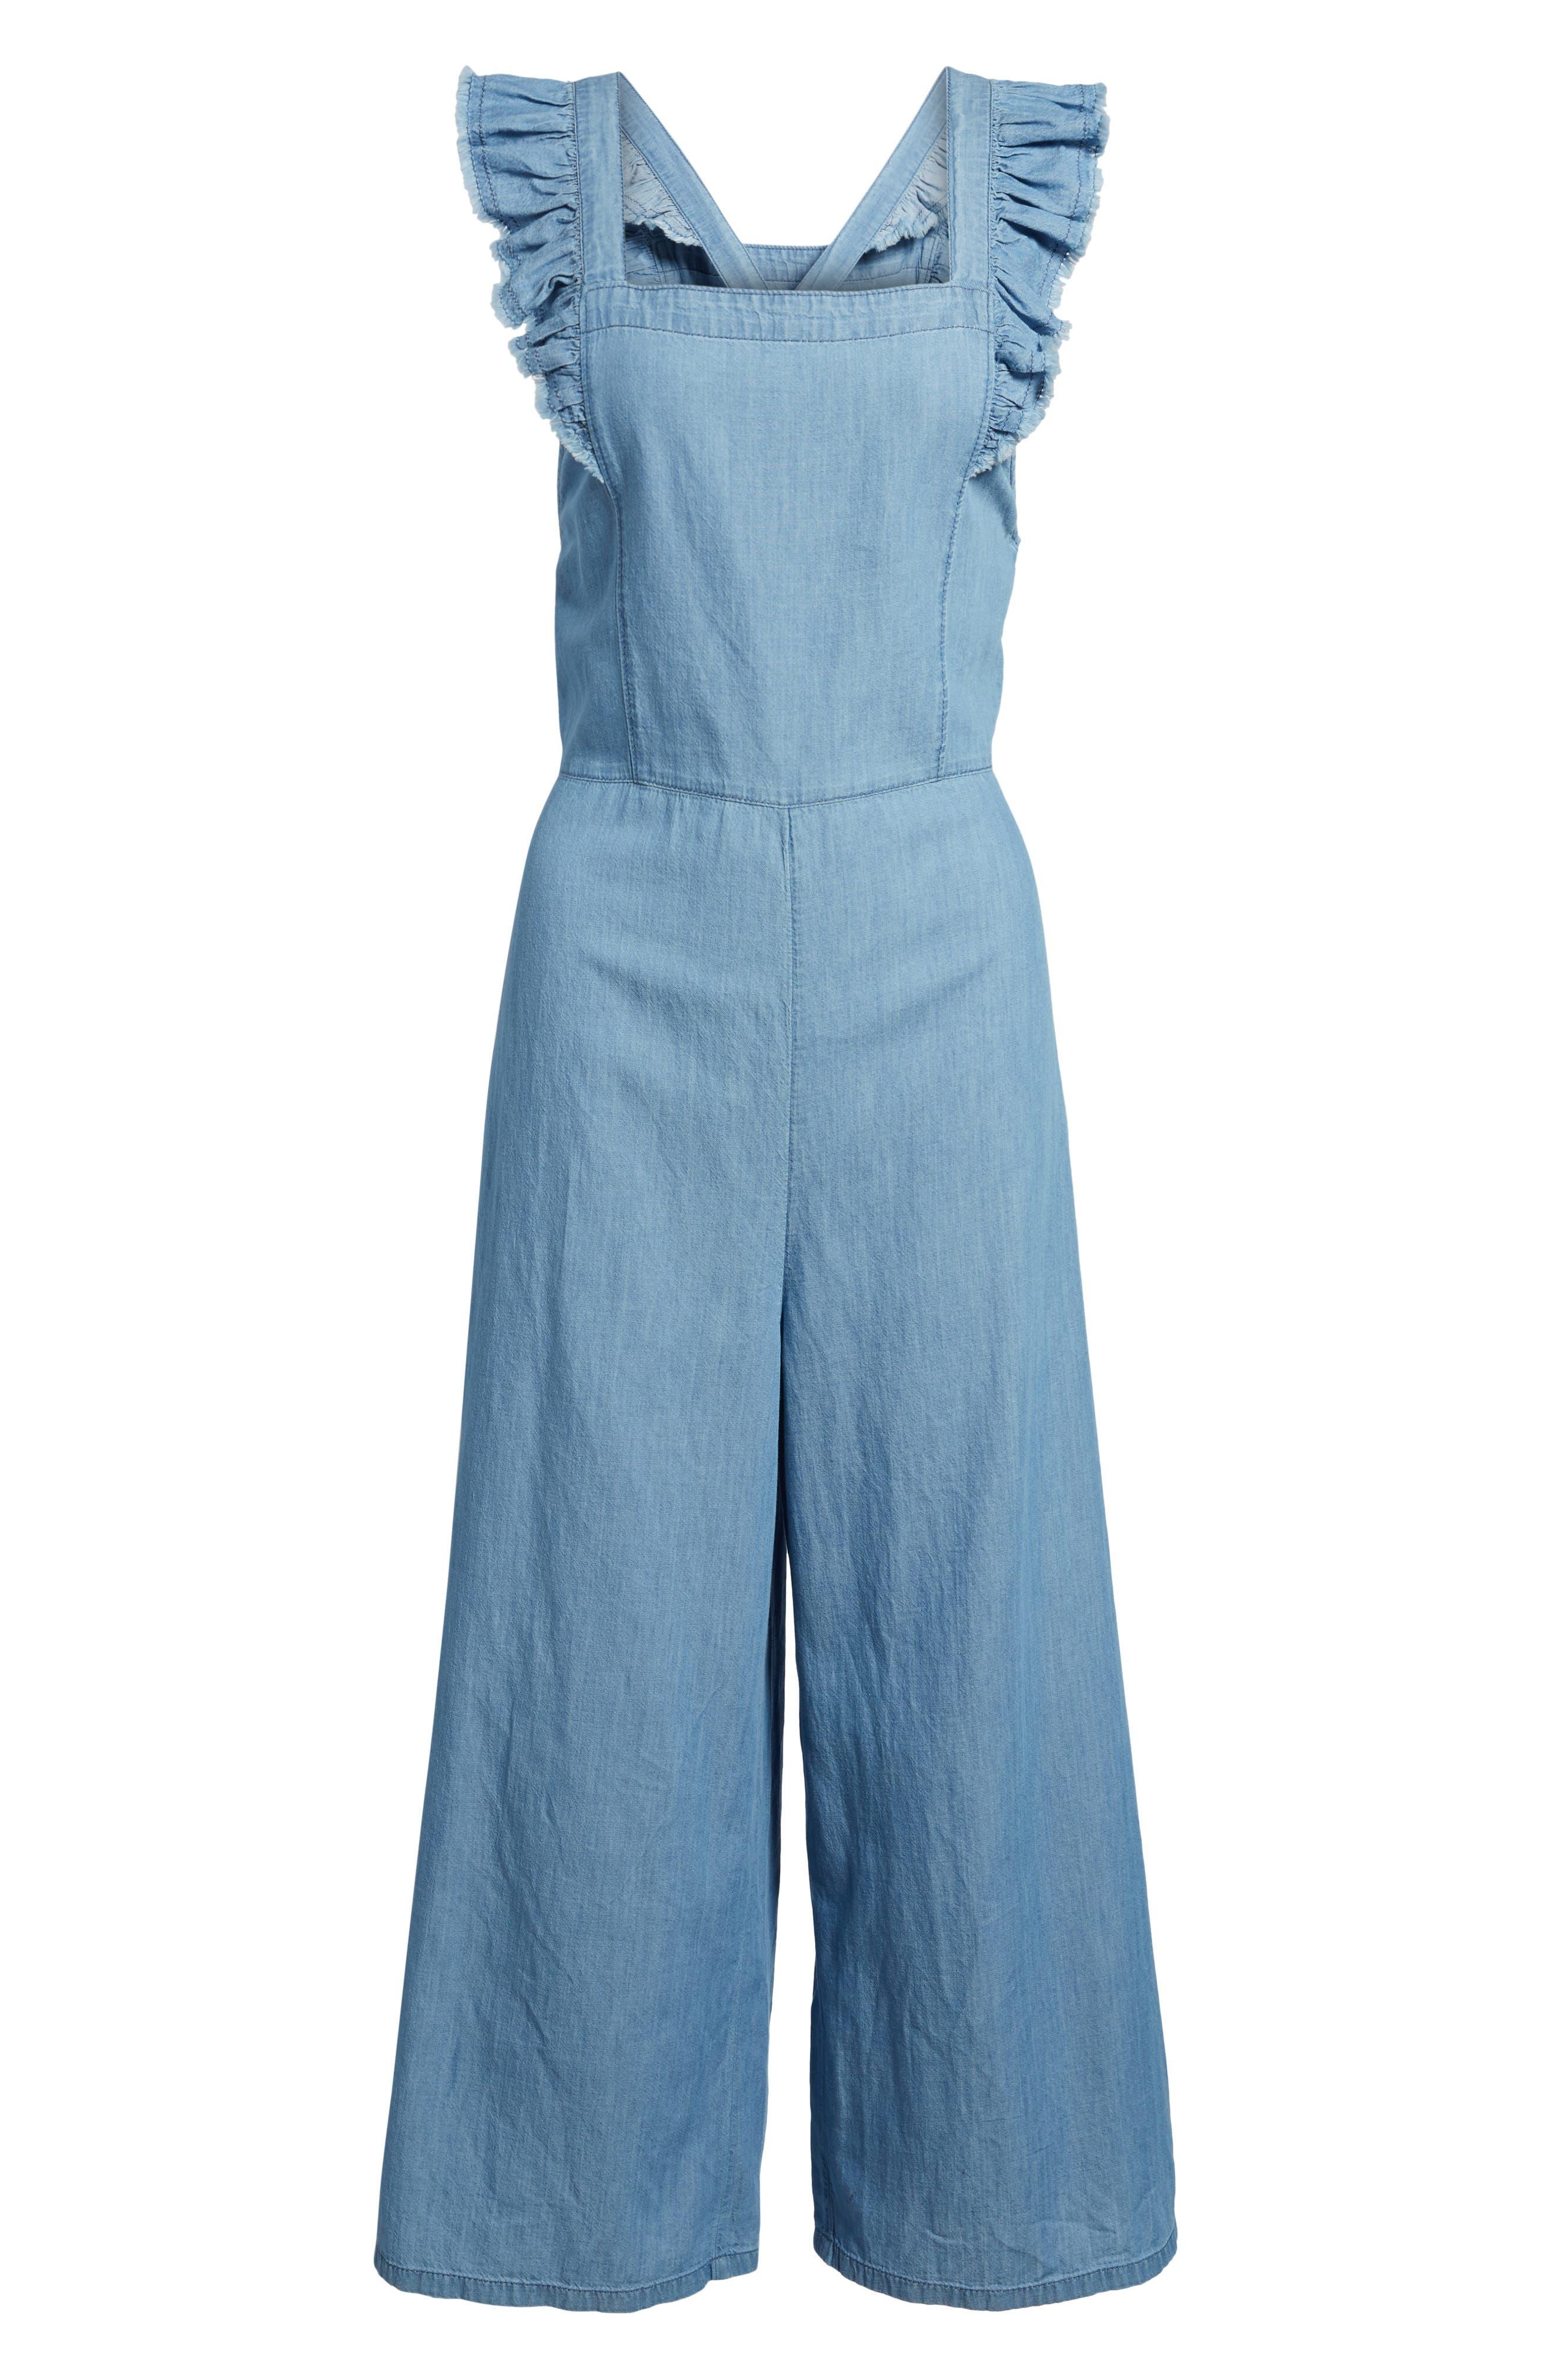 Chambray Apron Crop Jumpsuit,                             Alternate thumbnail 6, color,                             Medium Light Wash